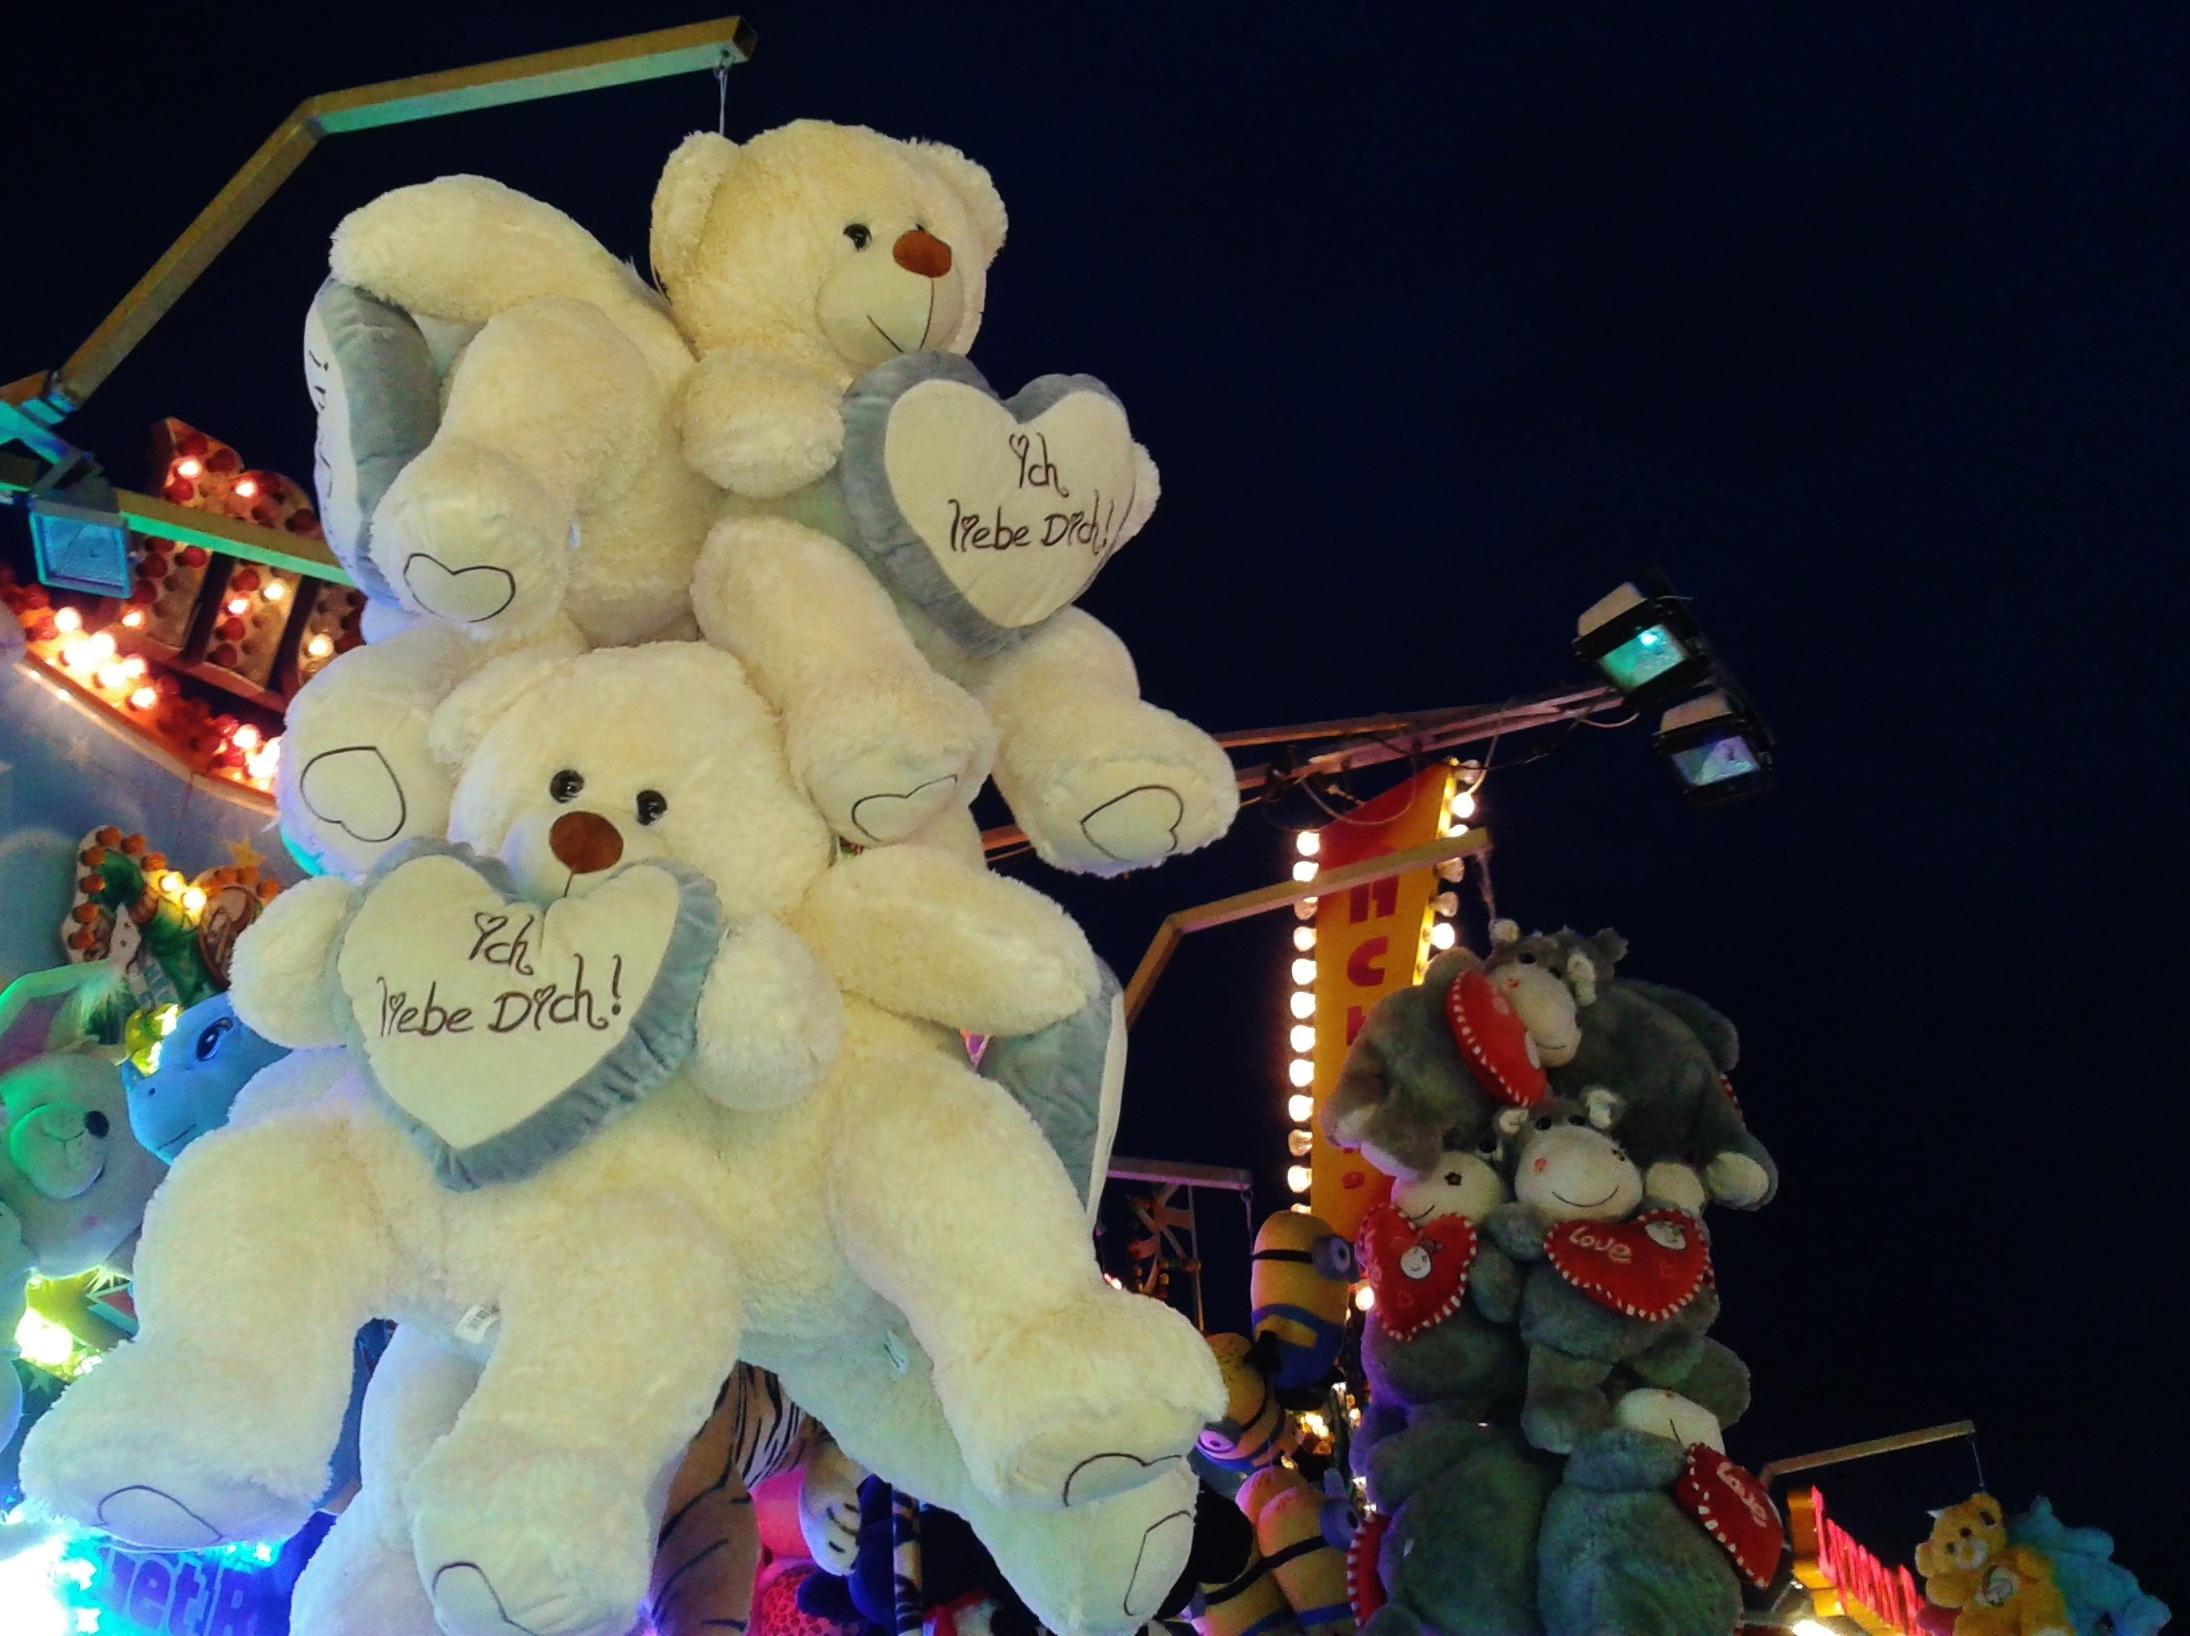 Free Images : cute, heart, leisure, fairground, teddy bear, affection, fun,  stuffed animal, fair, pleasure, children toys, folk festival, i love you,  ...